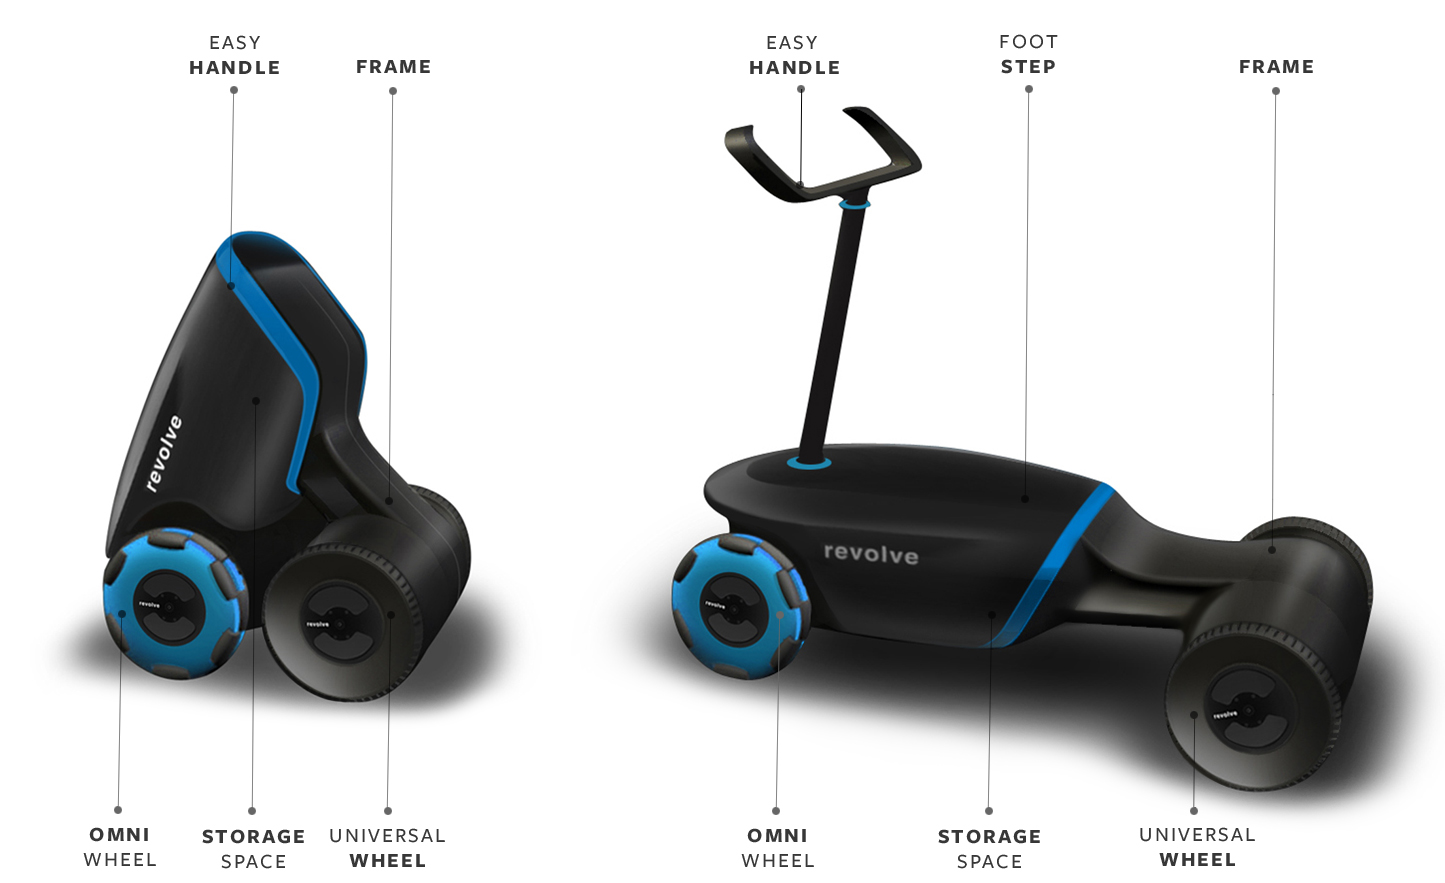 REVOLVE_wheel_scooter_trolley_Andrea Mocellin